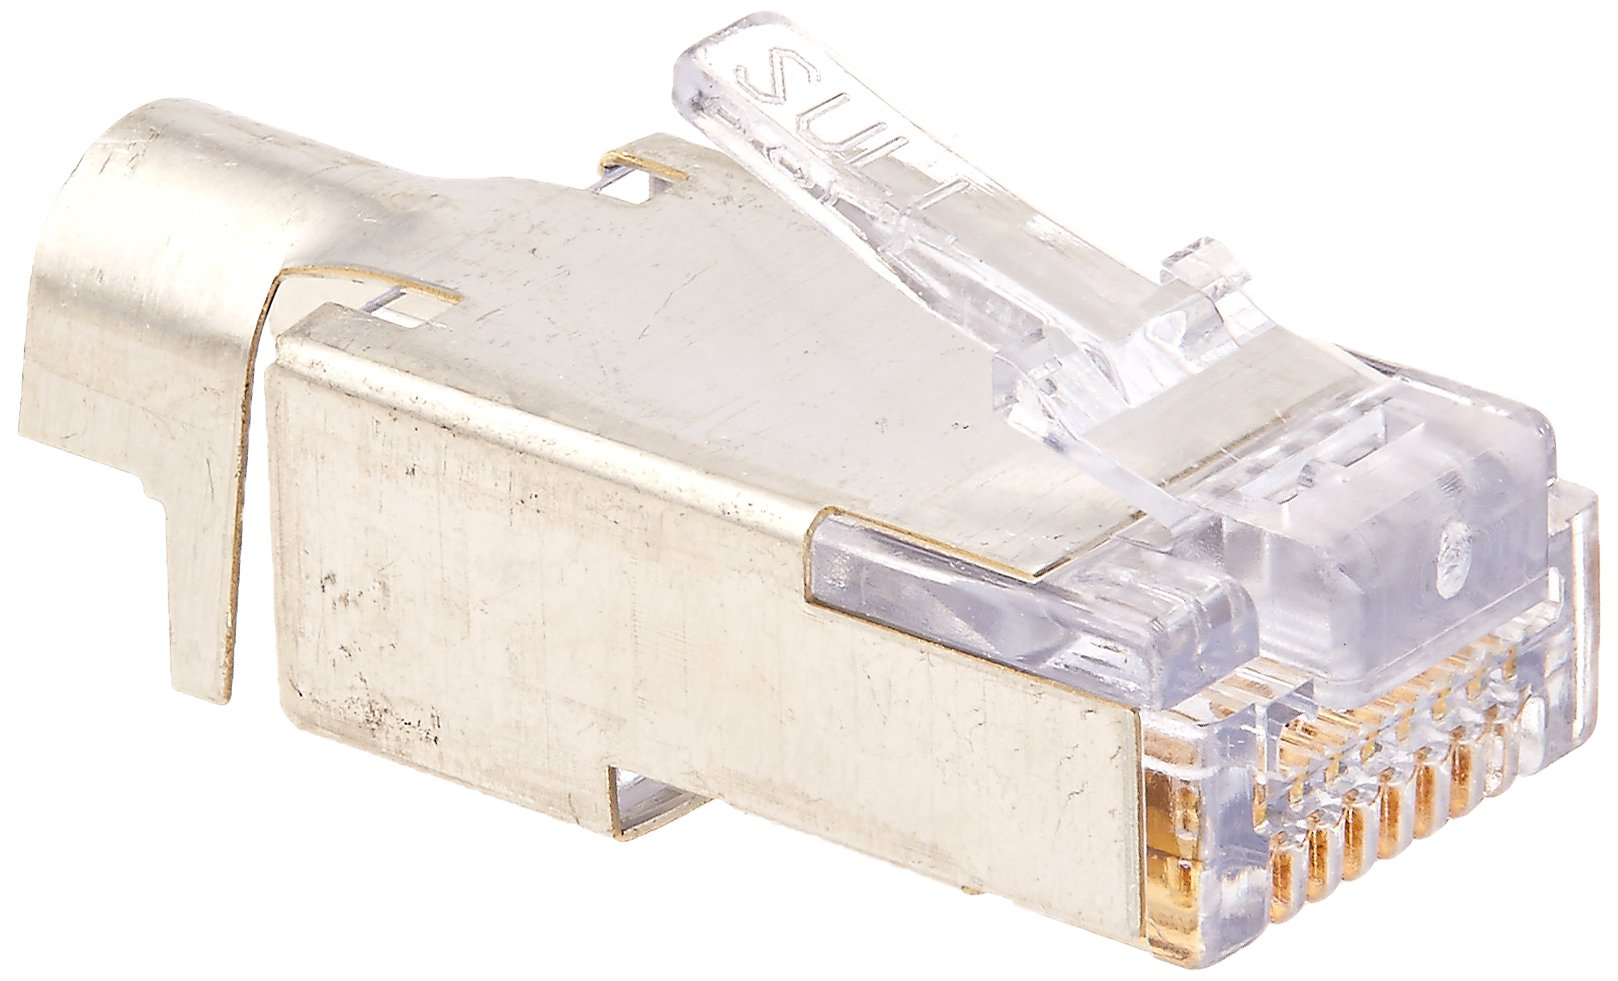 Platinum Tools 100022 EZ-RJ45 Shielded Cat5e/6 External Ground, 50-Pack by Platinum Tools